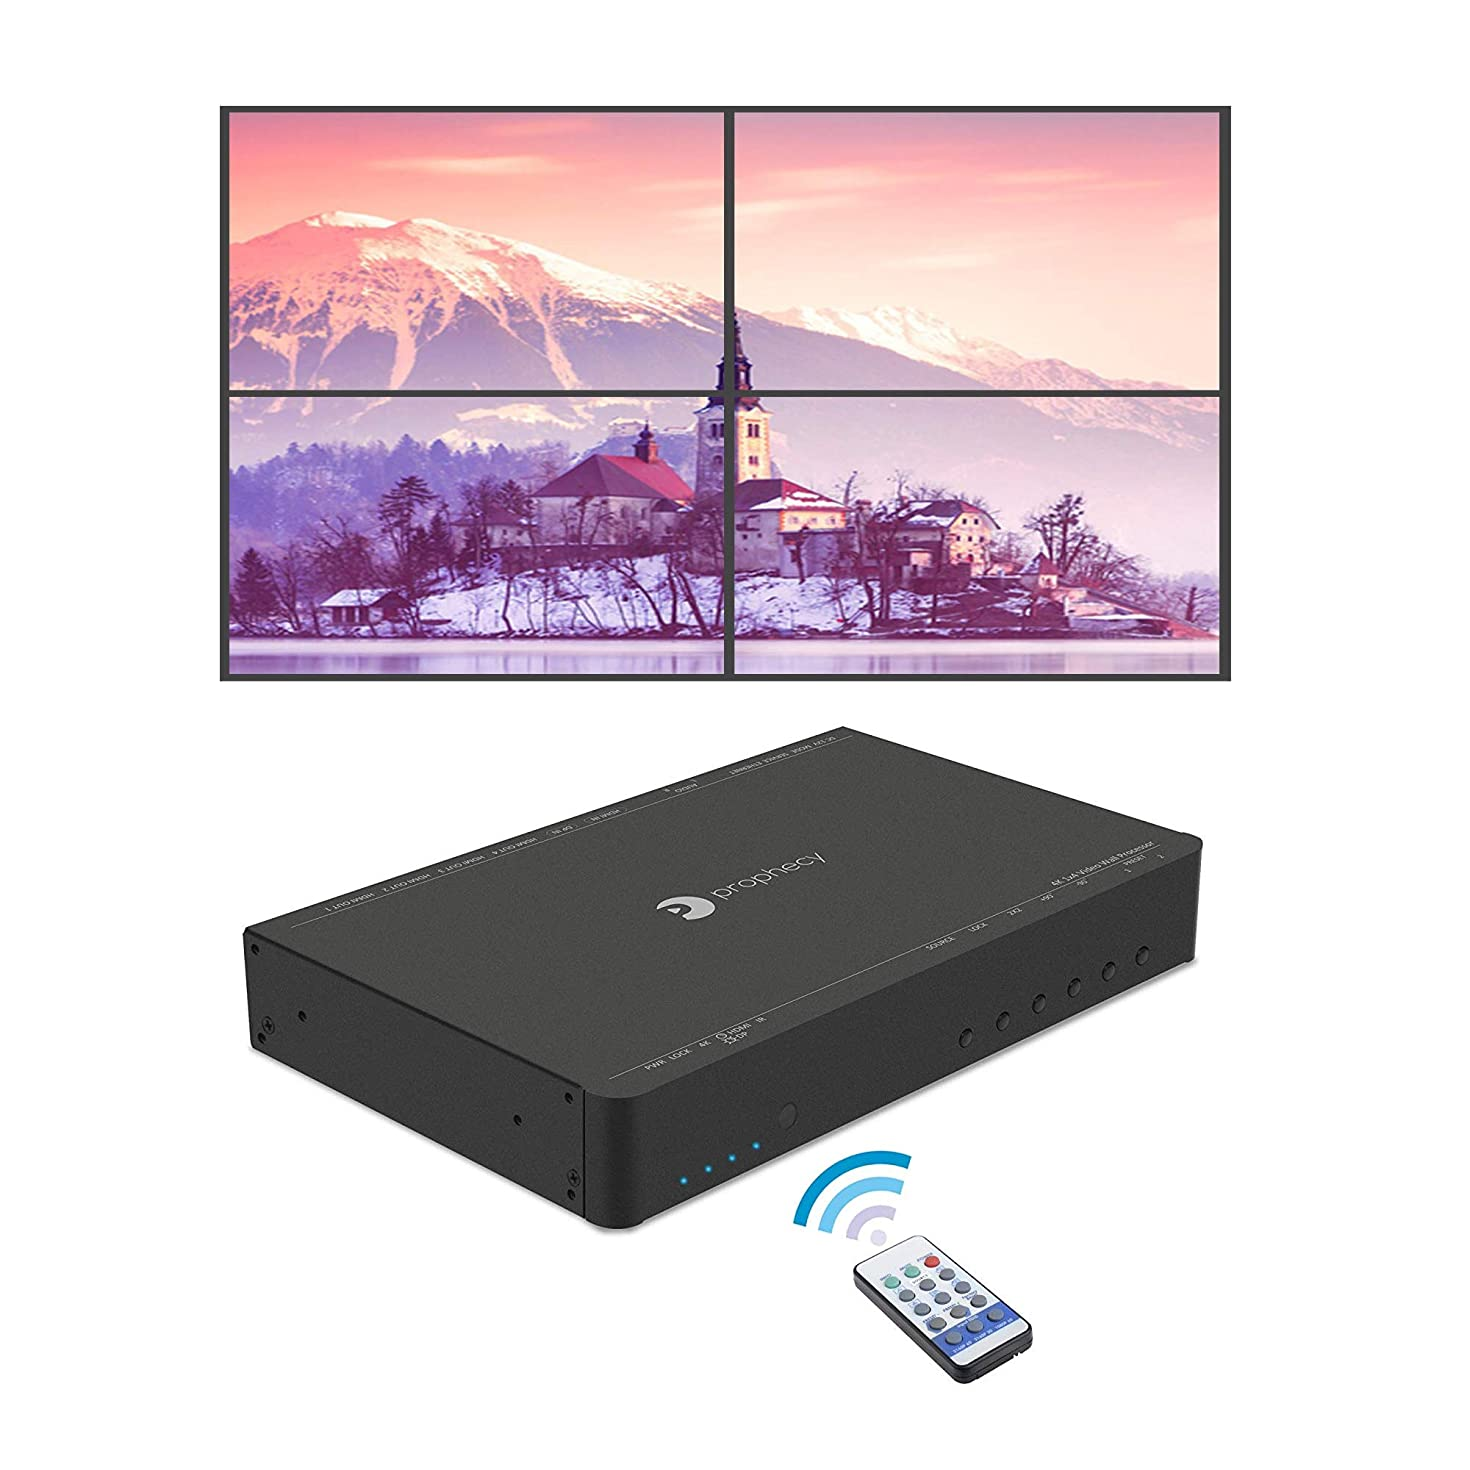 gofanco Prophecy 4K HDMI 2x2 Video Wall Controller & Processor – Up to 4K/60Hz YUV 4:4:4, 1x HDMI or Mini DisplayPort 1.2 Input, Bezel Correction (Supports 1x1, 2x2, 1x3, 3x1, 1x4, 4x1)